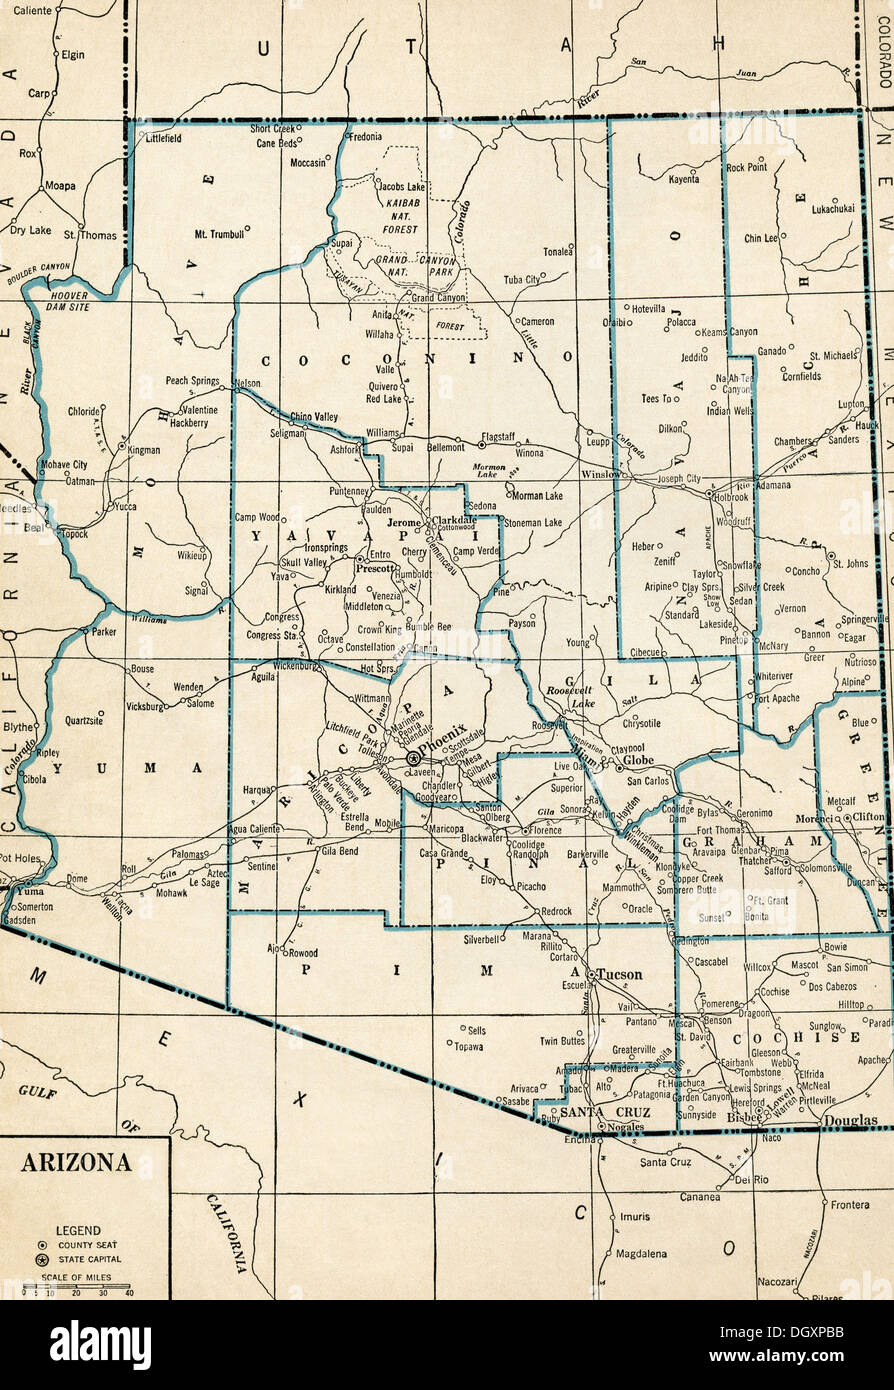 Map Of Old Arizona.Old Map Of Arizona State 1930 S Stock Photo 62053919 Alamy